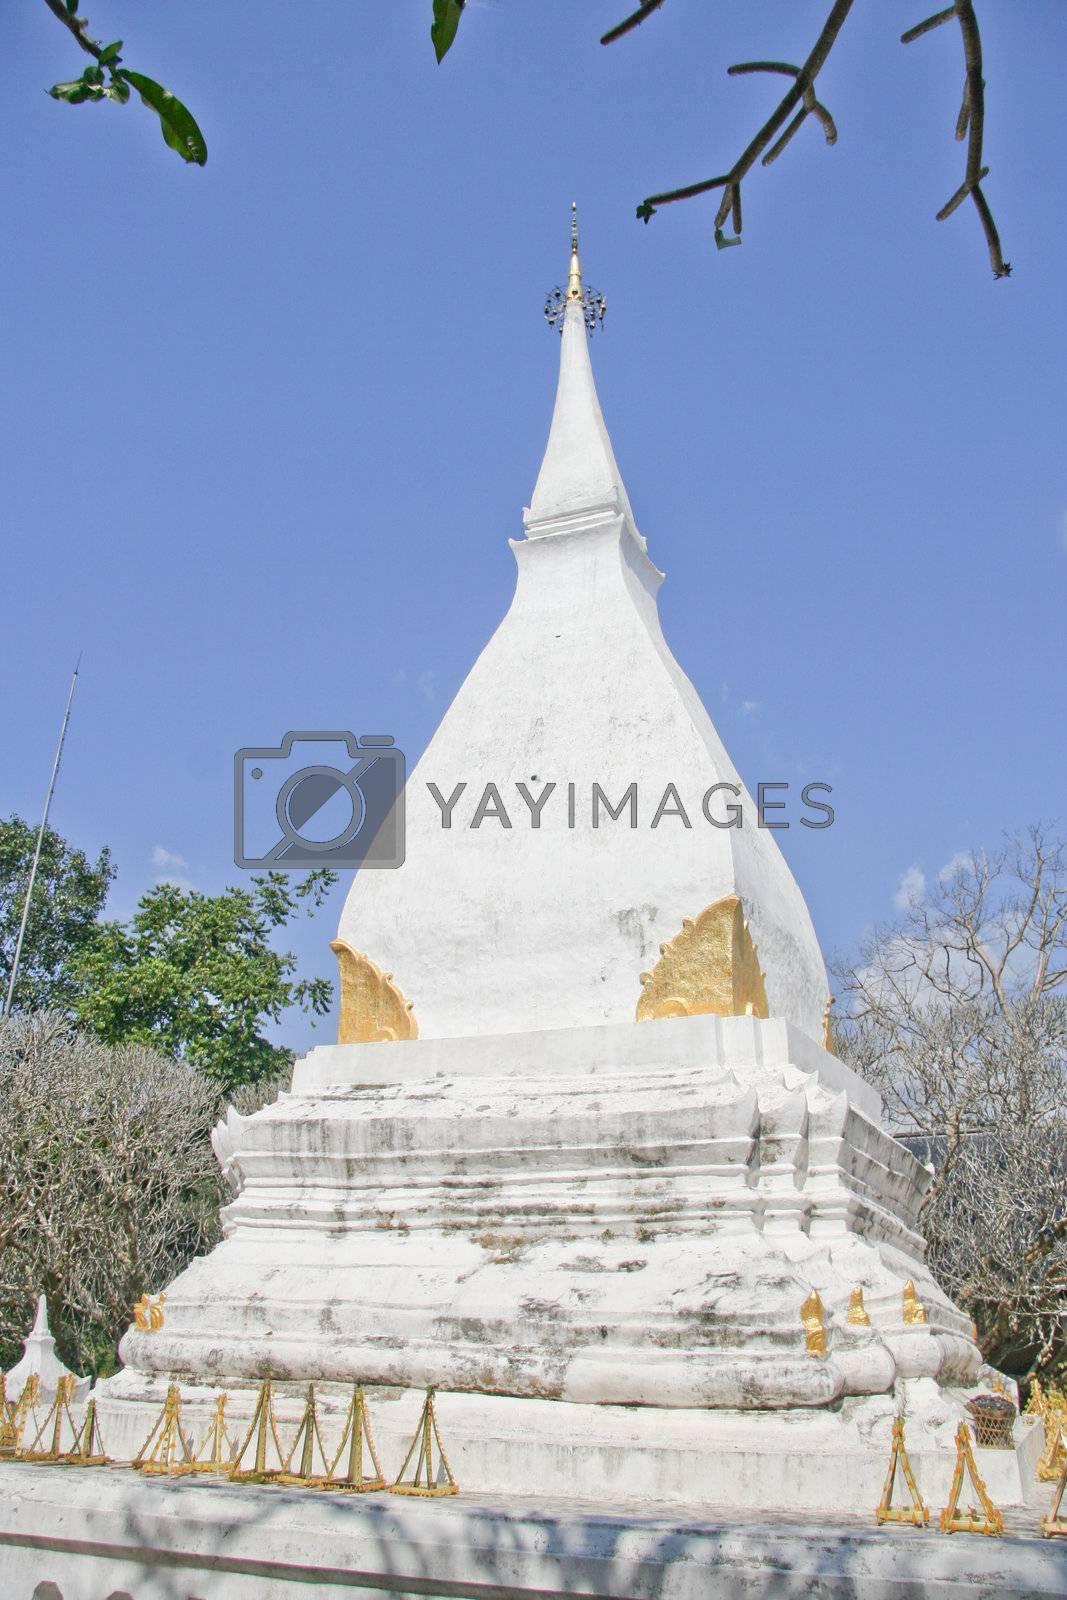 White Pagoda in Thailand